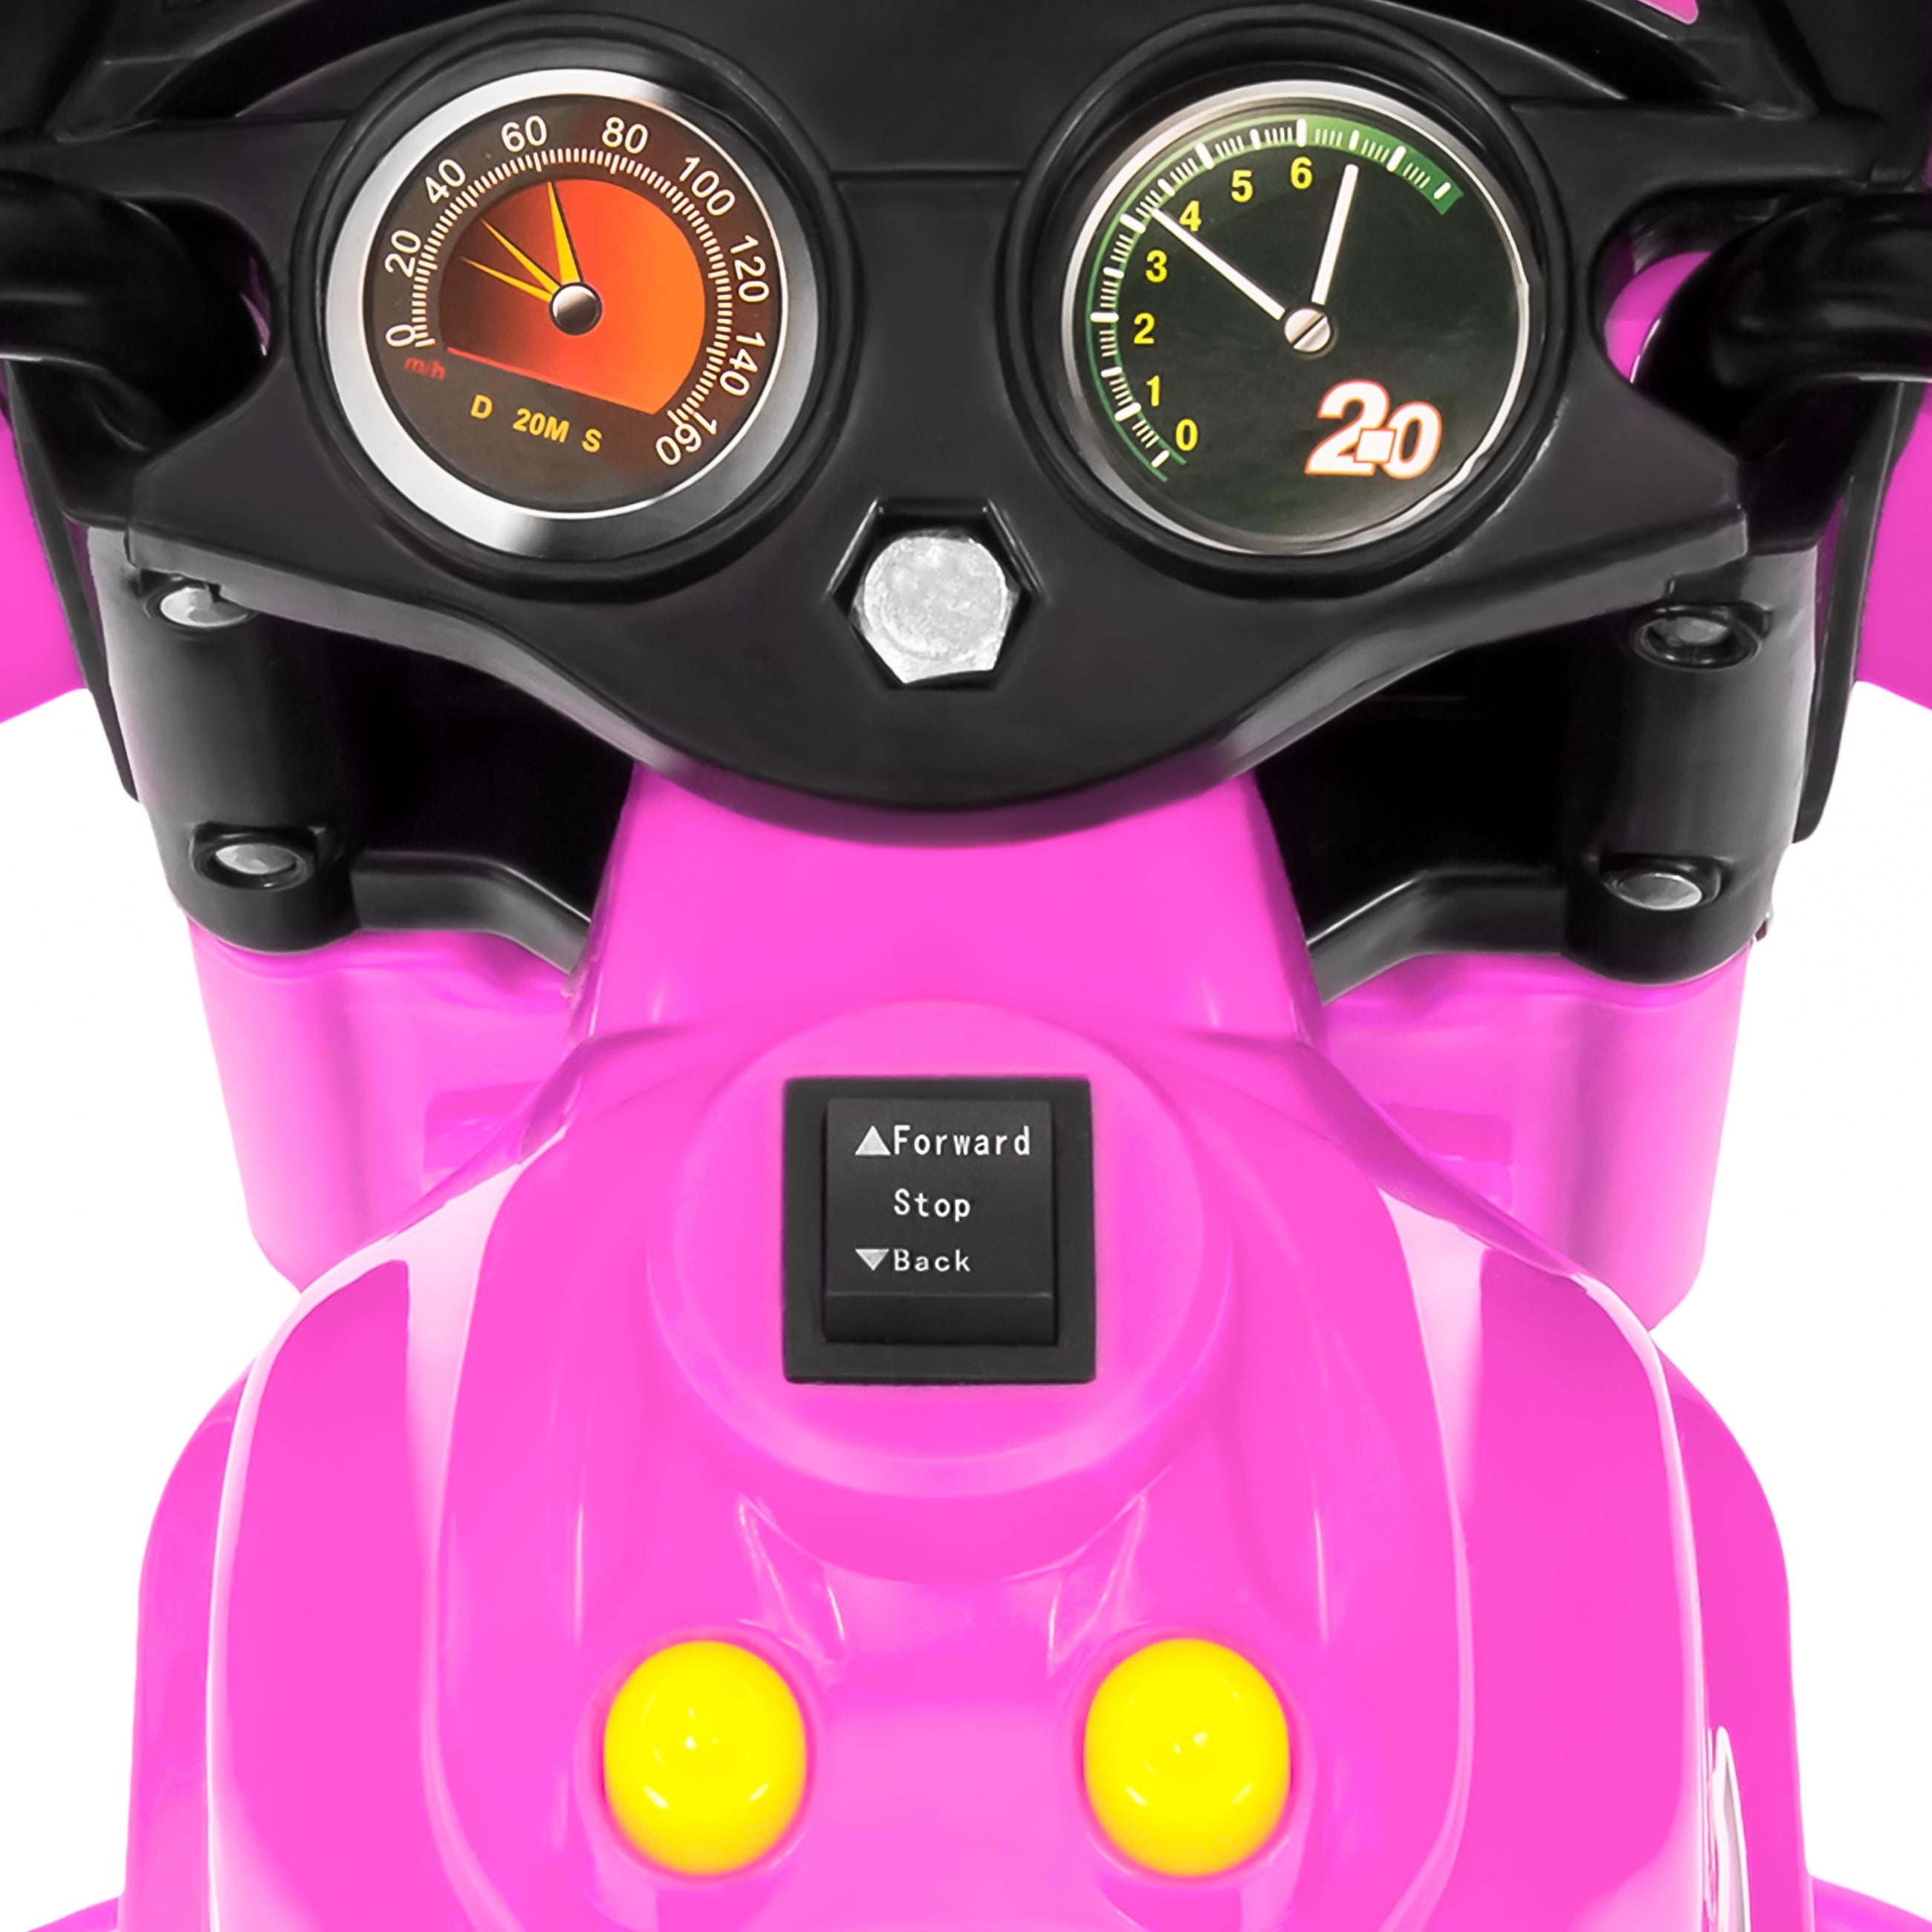 BCP-6V-Kids-3-Wheel-Motorcycle-Ride-On-Toy-w-LED-Lights-Music-Storage thumbnail 29